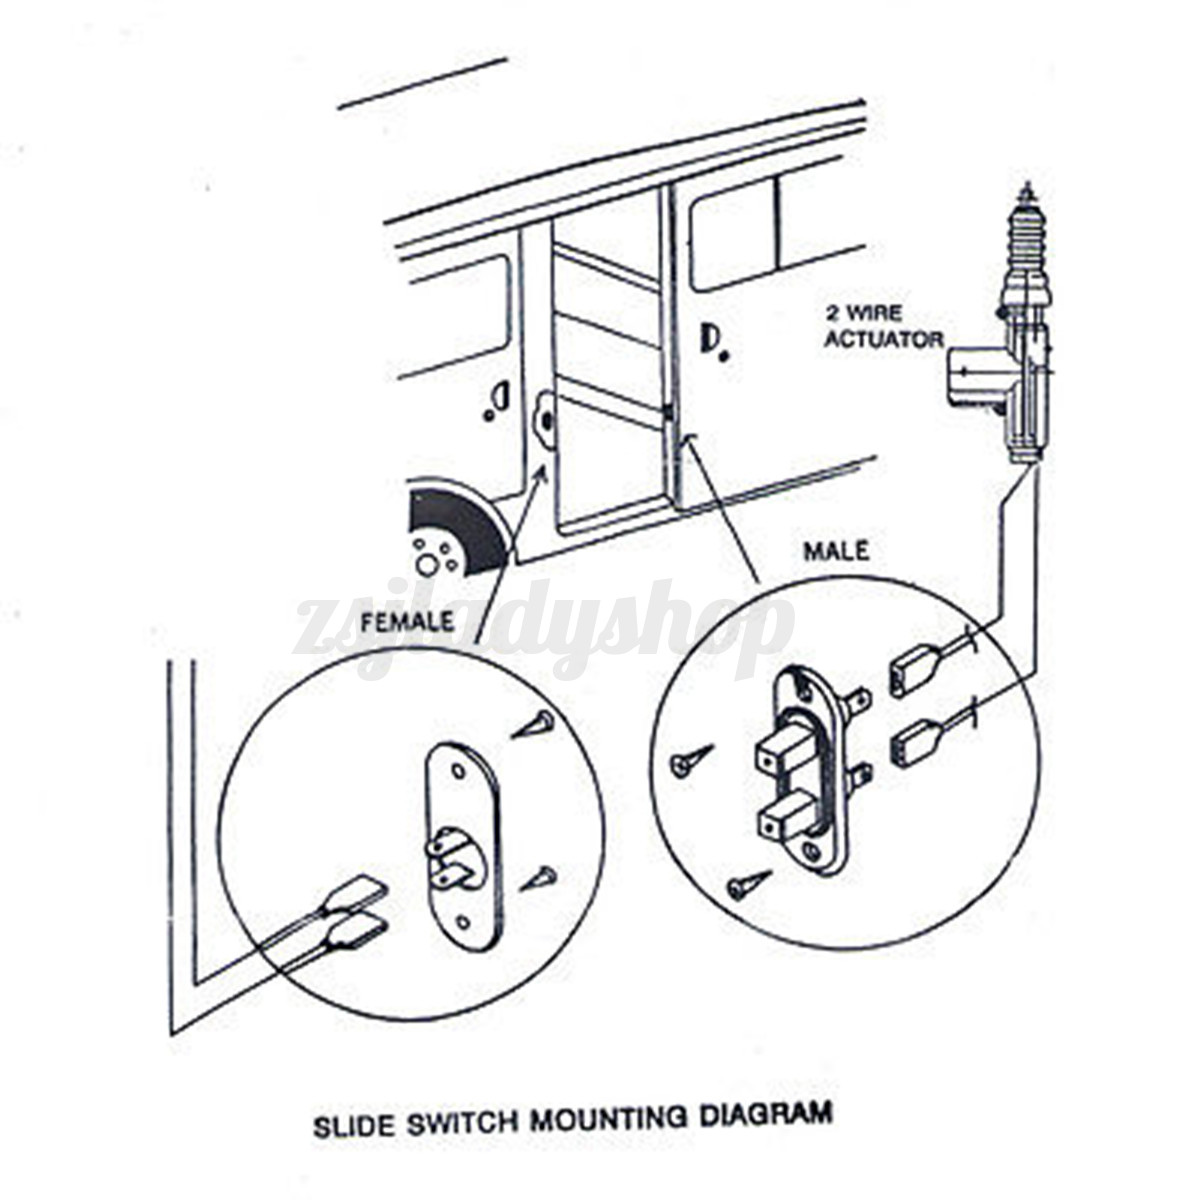 hight resolution of central locking wiring diagram wirdig van alarm central locking on car alarm central locking wiring diagram